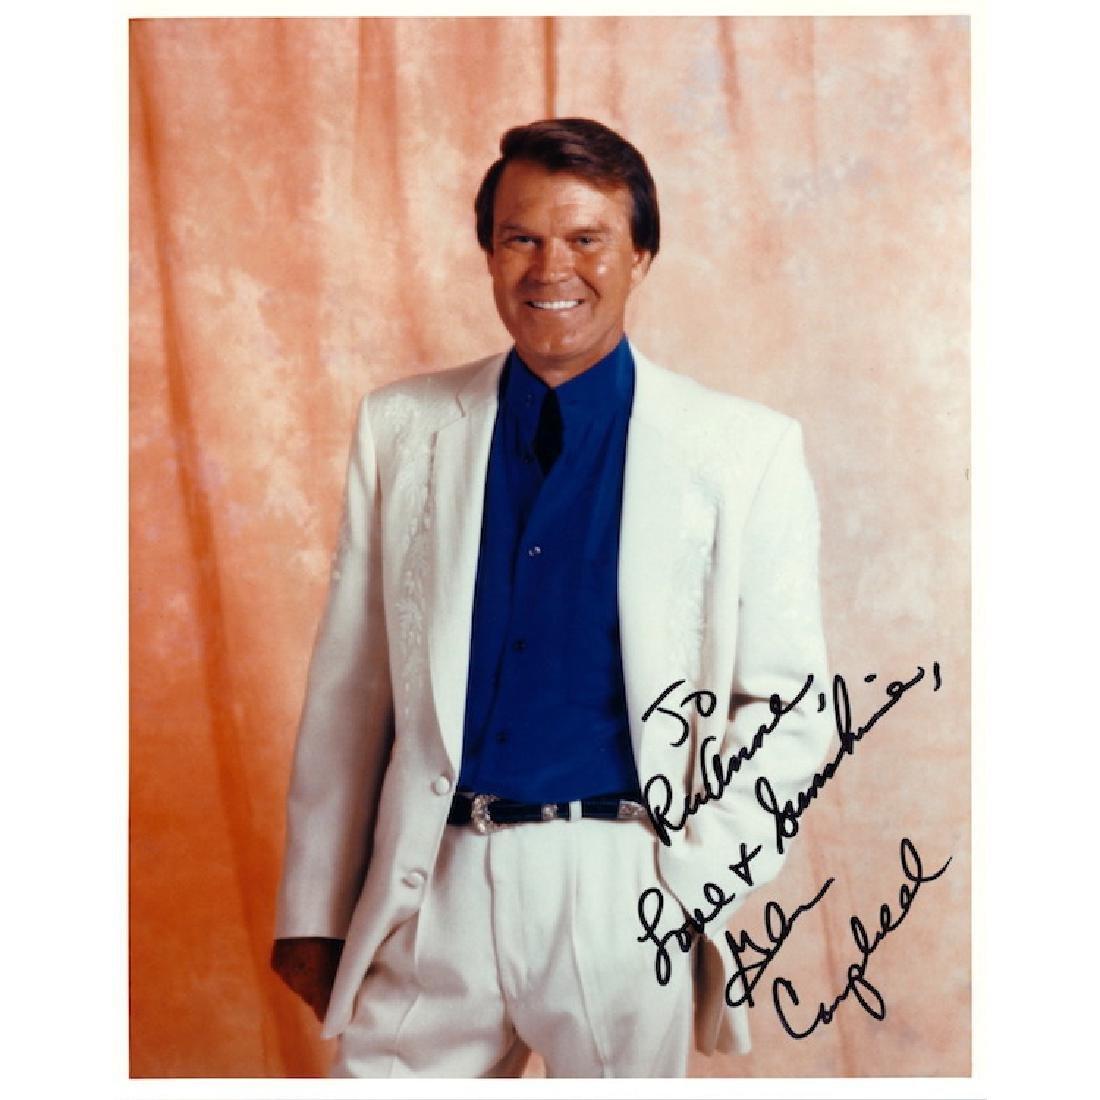 Glen Campbell Autographed Photograph